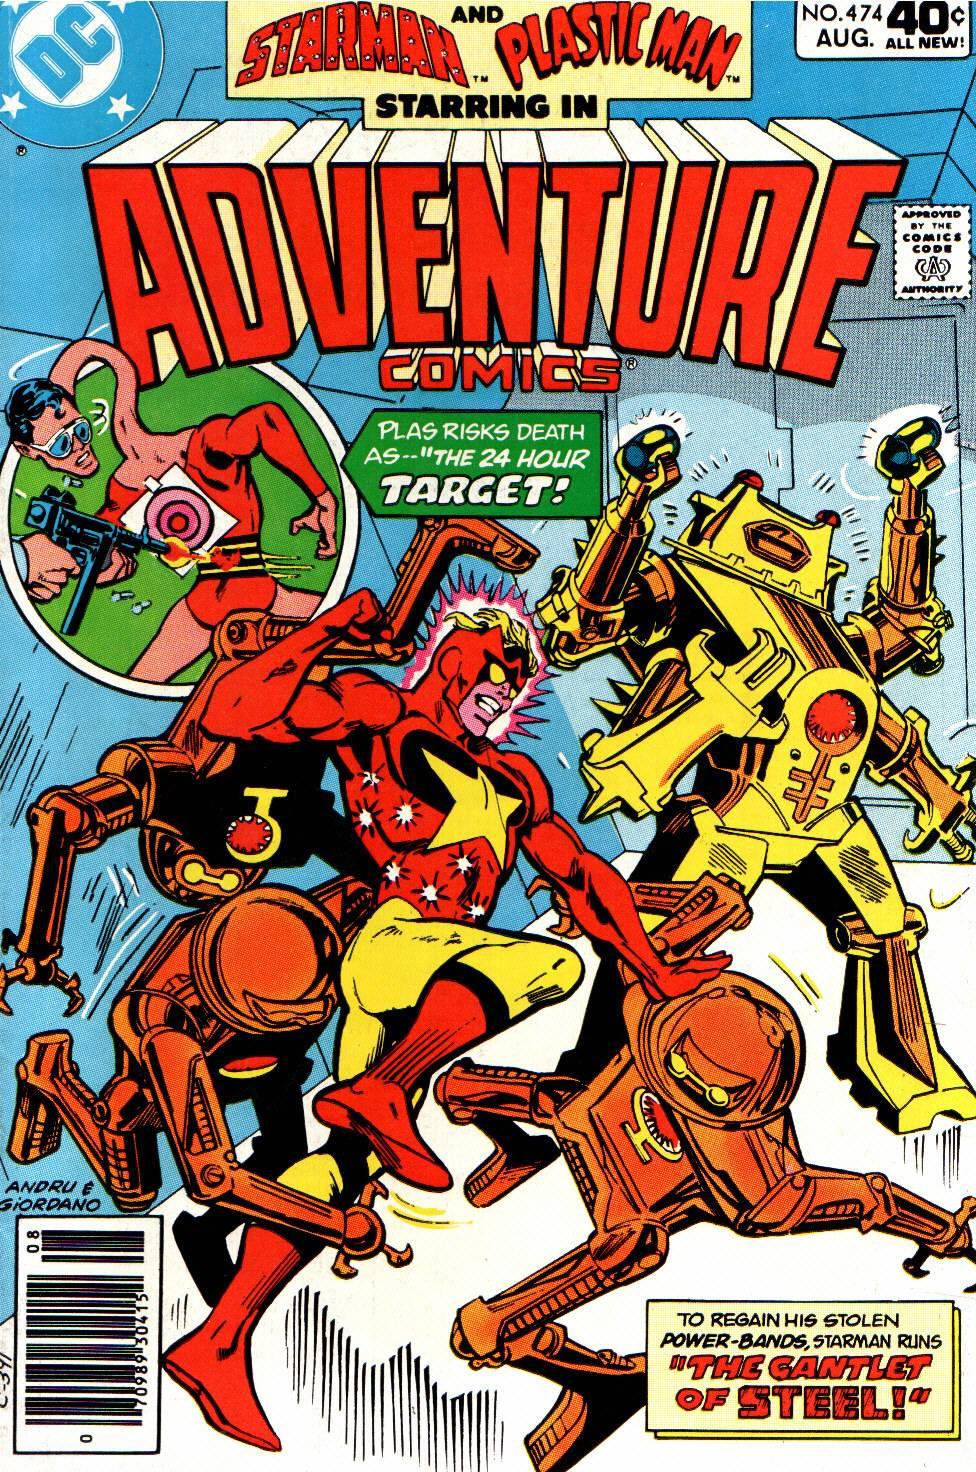 Read online Adventure Comics (1938) comic -  Issue #474 - 1